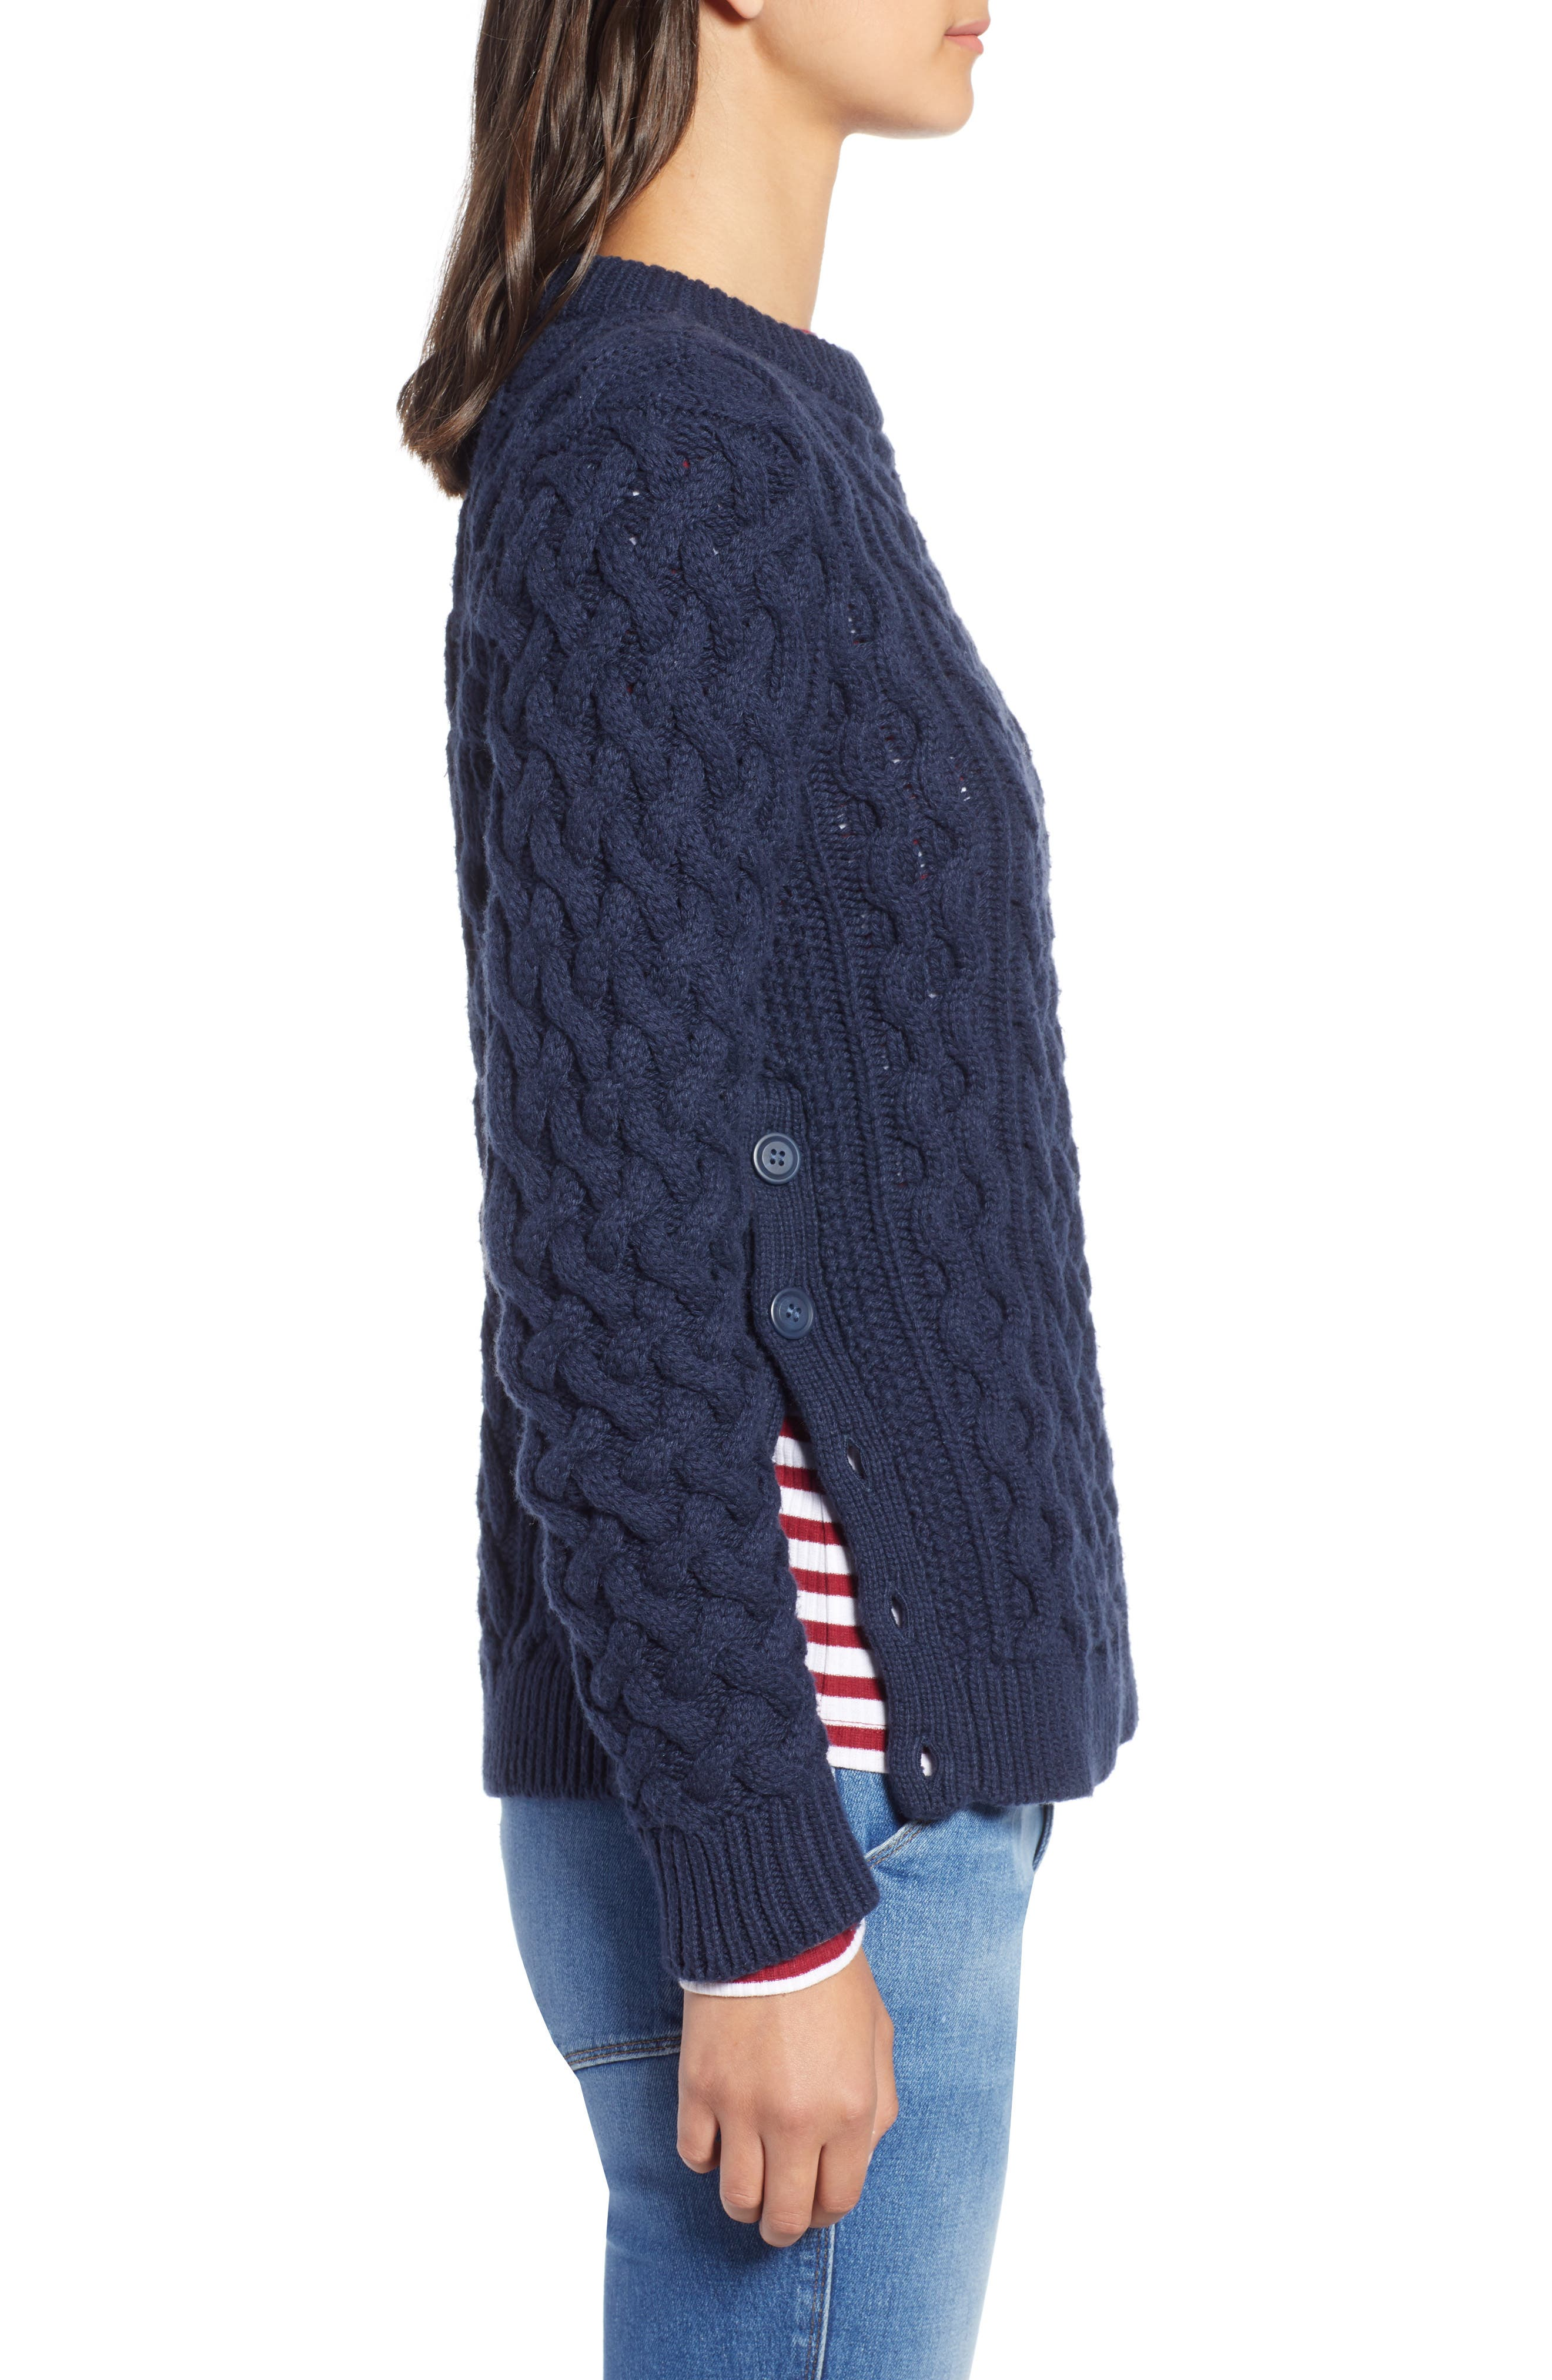 Fisherwoman Crewneck Pullover Sweater,                             Alternate thumbnail 3, color,                             NAVY BLAZER